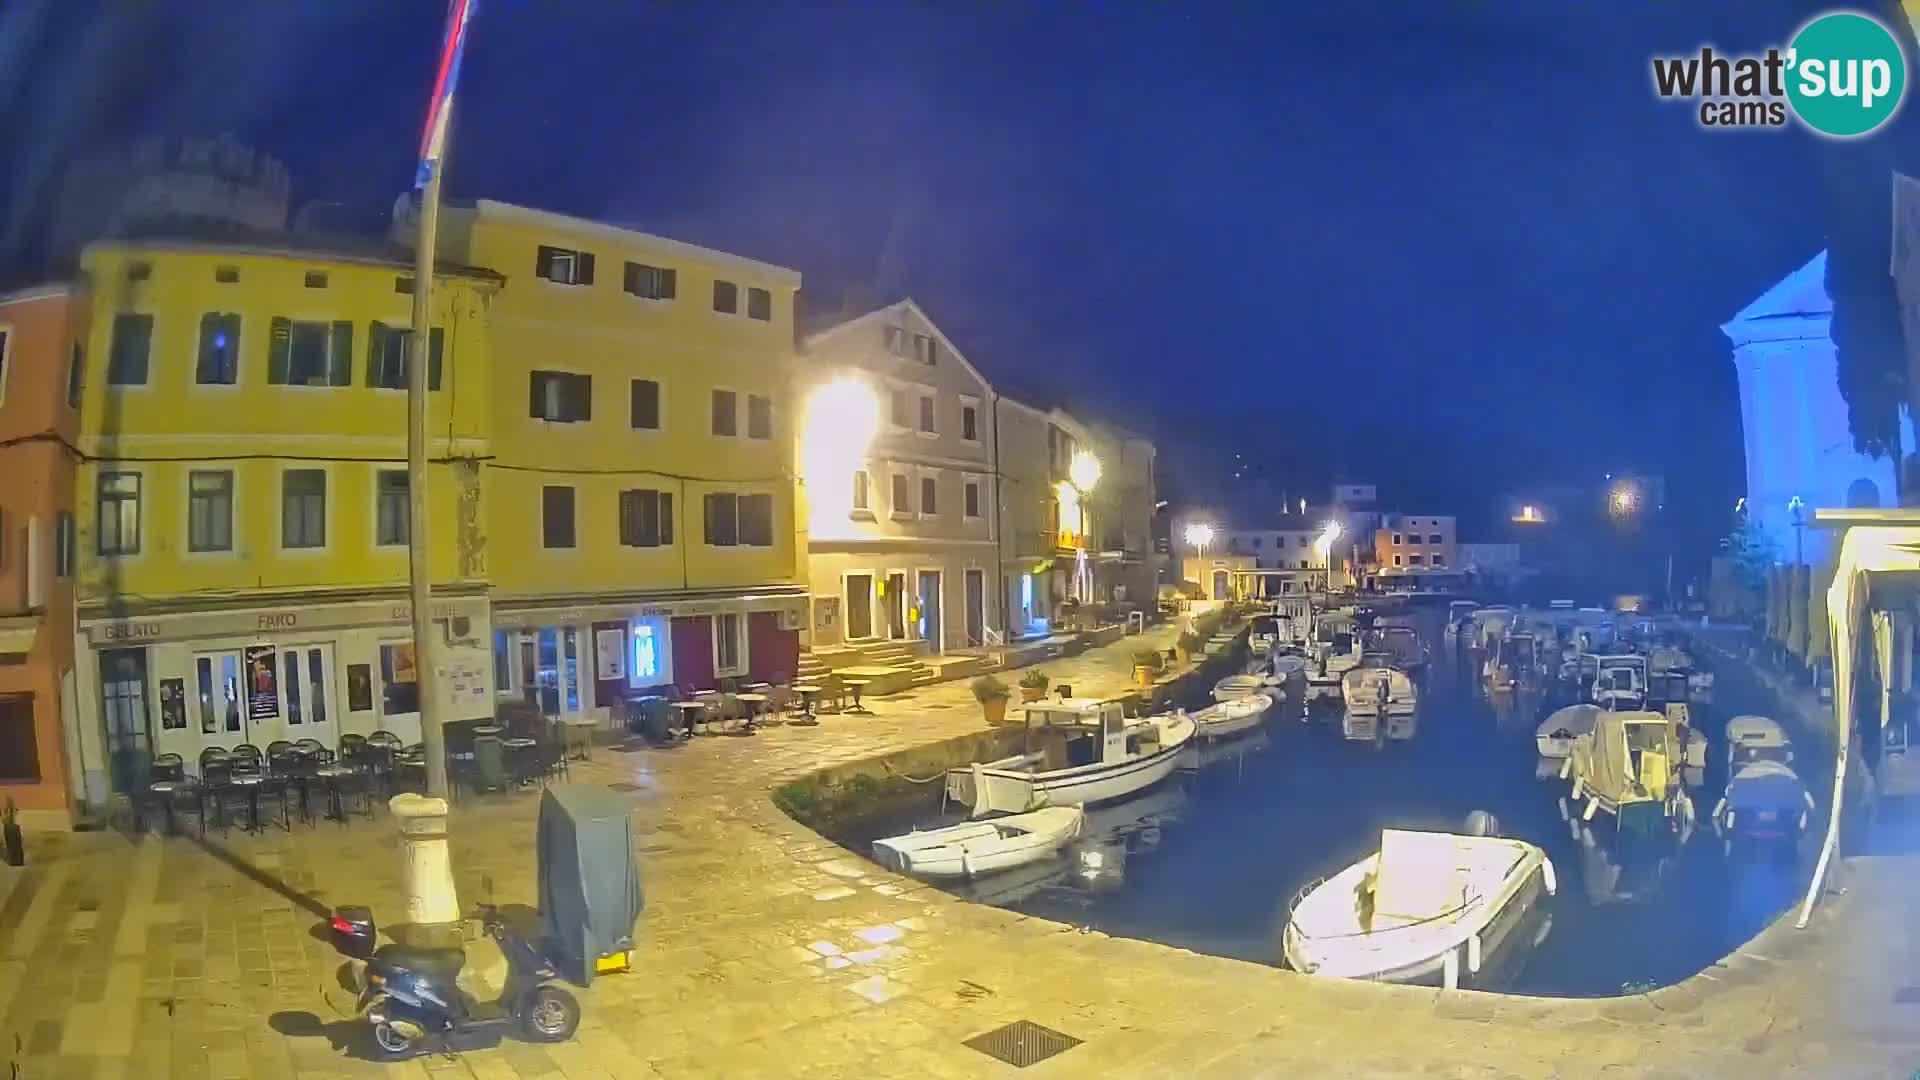 Webcam Live – The harbor of Veli Lošinj